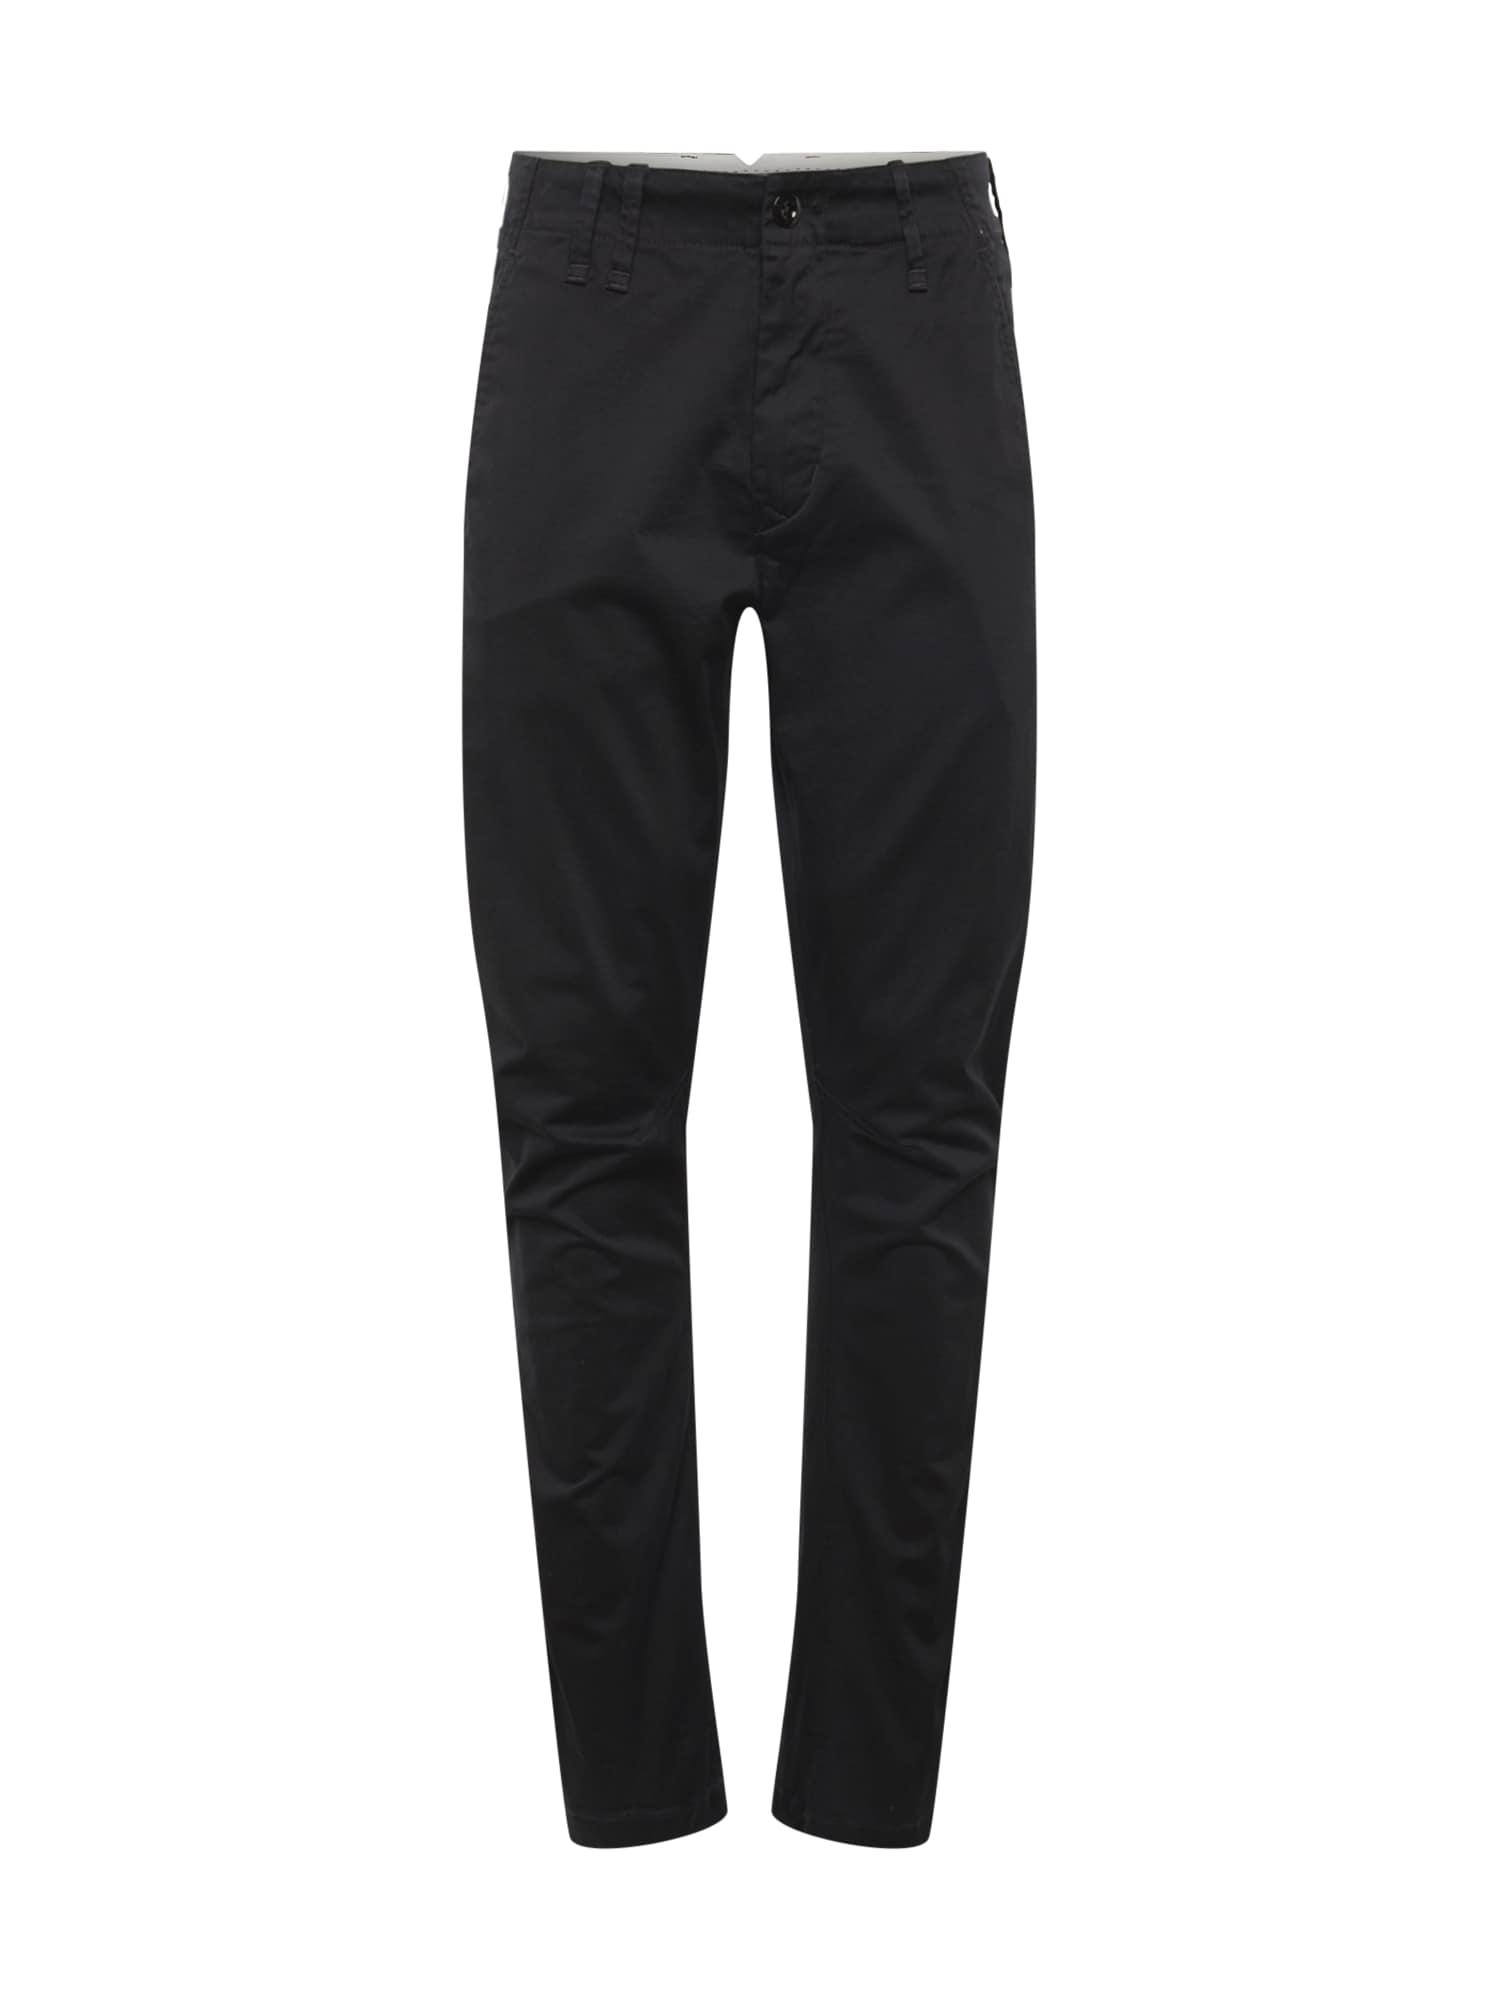 Chino kalhoty Vetar černá G-STAR RAW